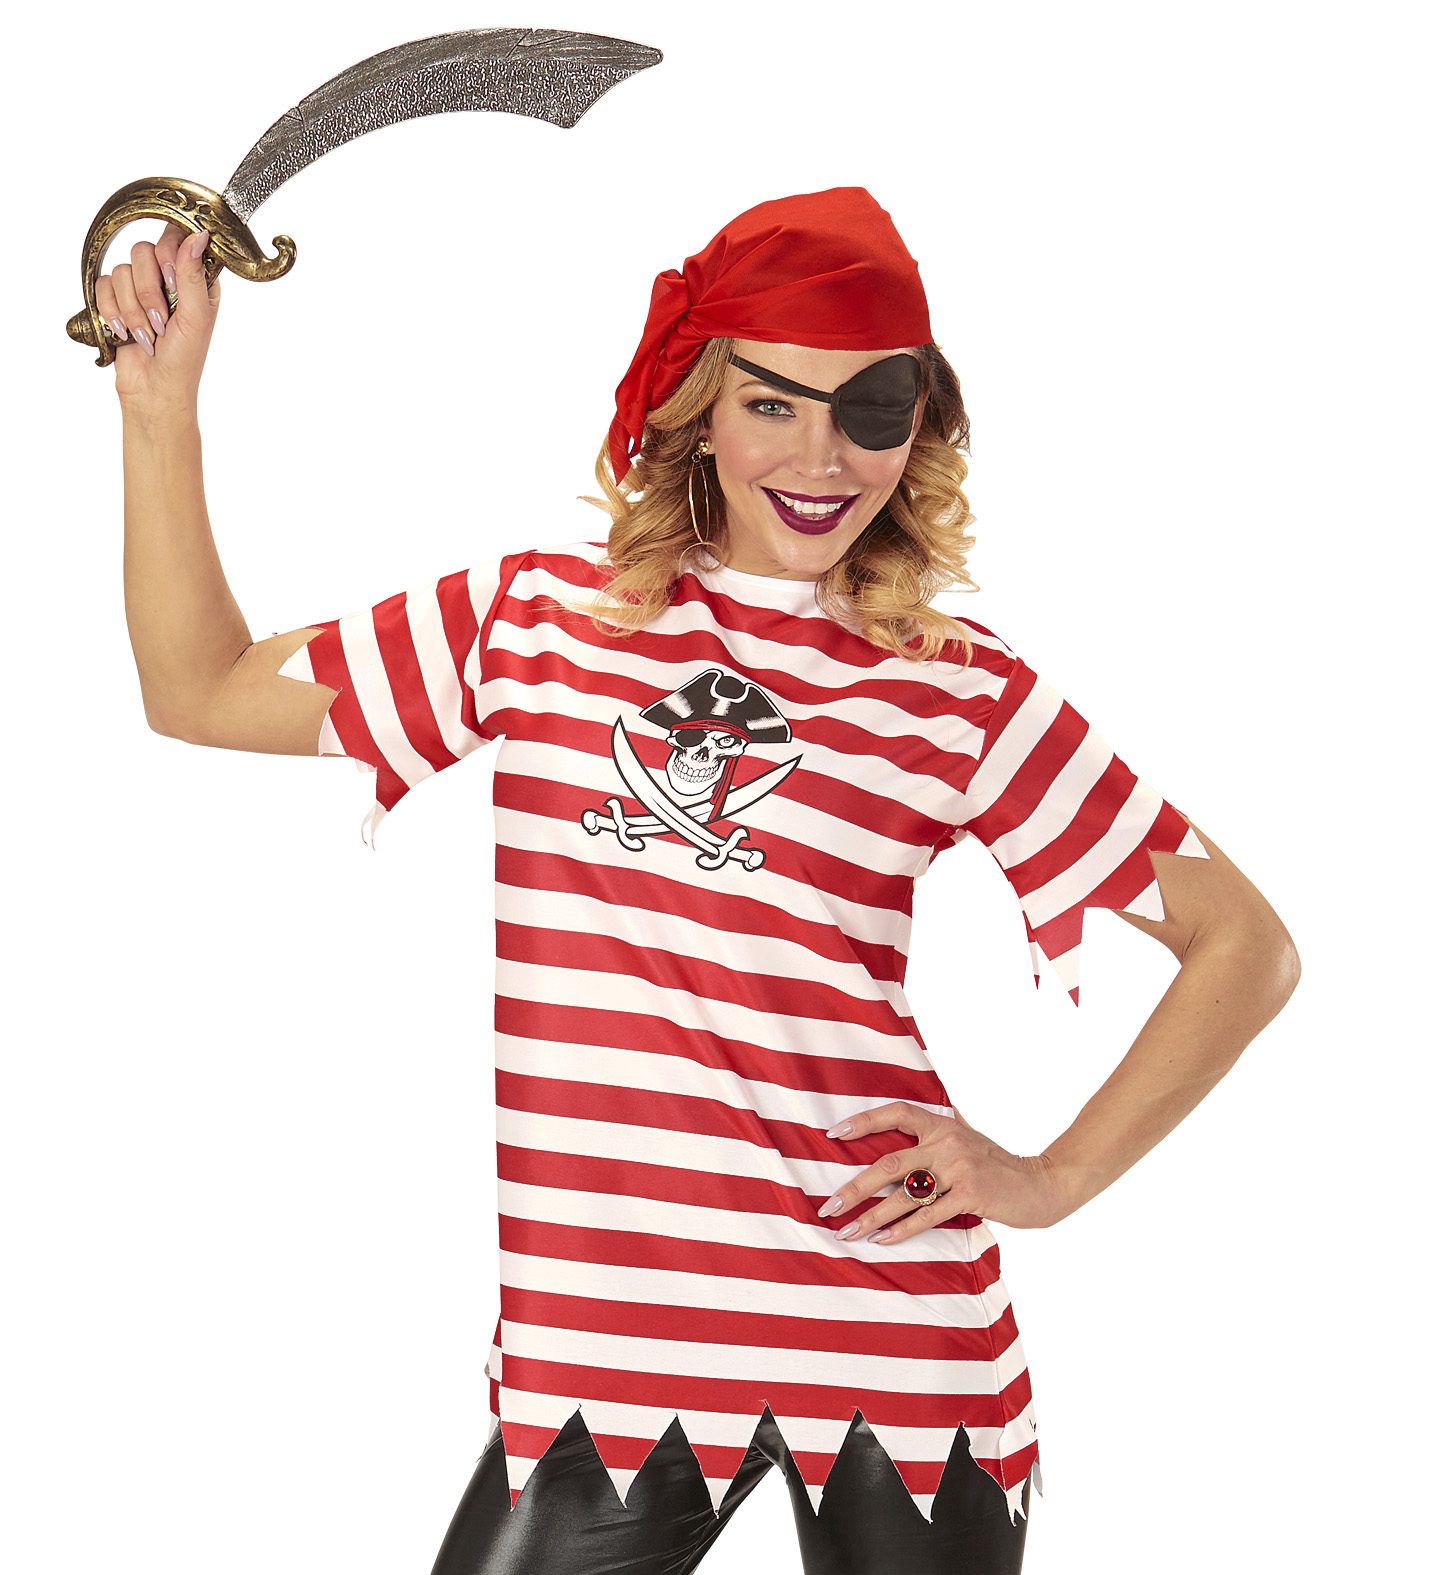 Striped Pirate Girl T-Shirt Pirate Fancy Dress